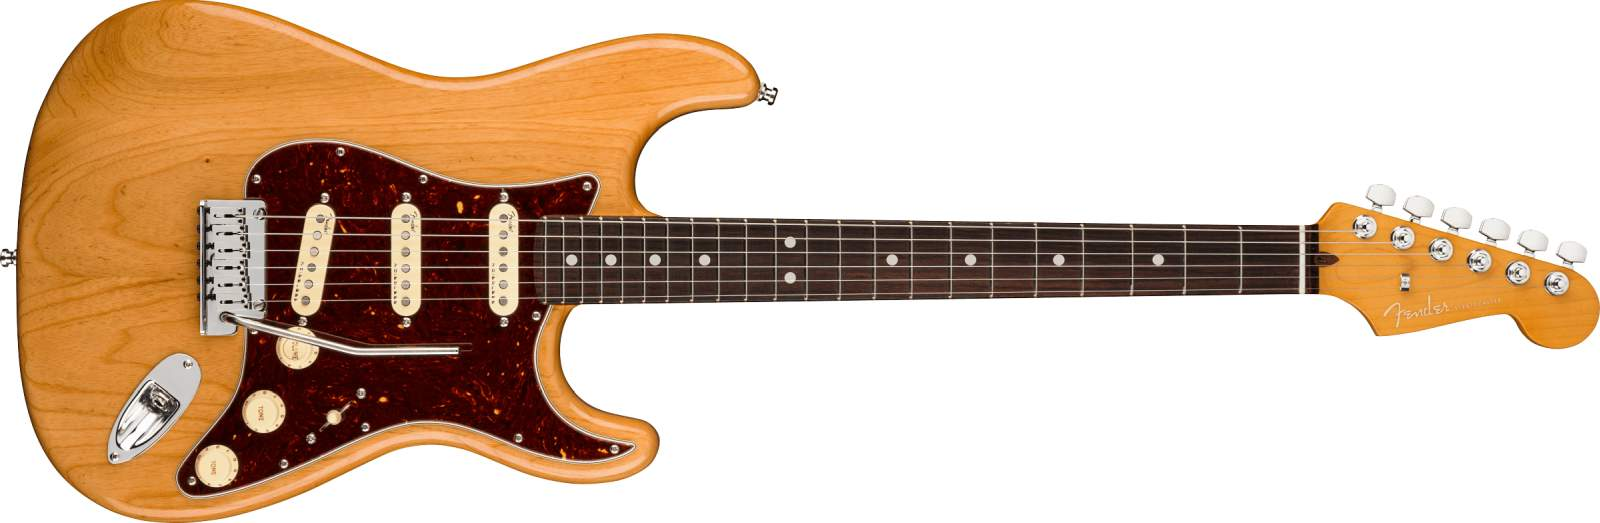 Fender American Ultra Stratocaster RW Natur